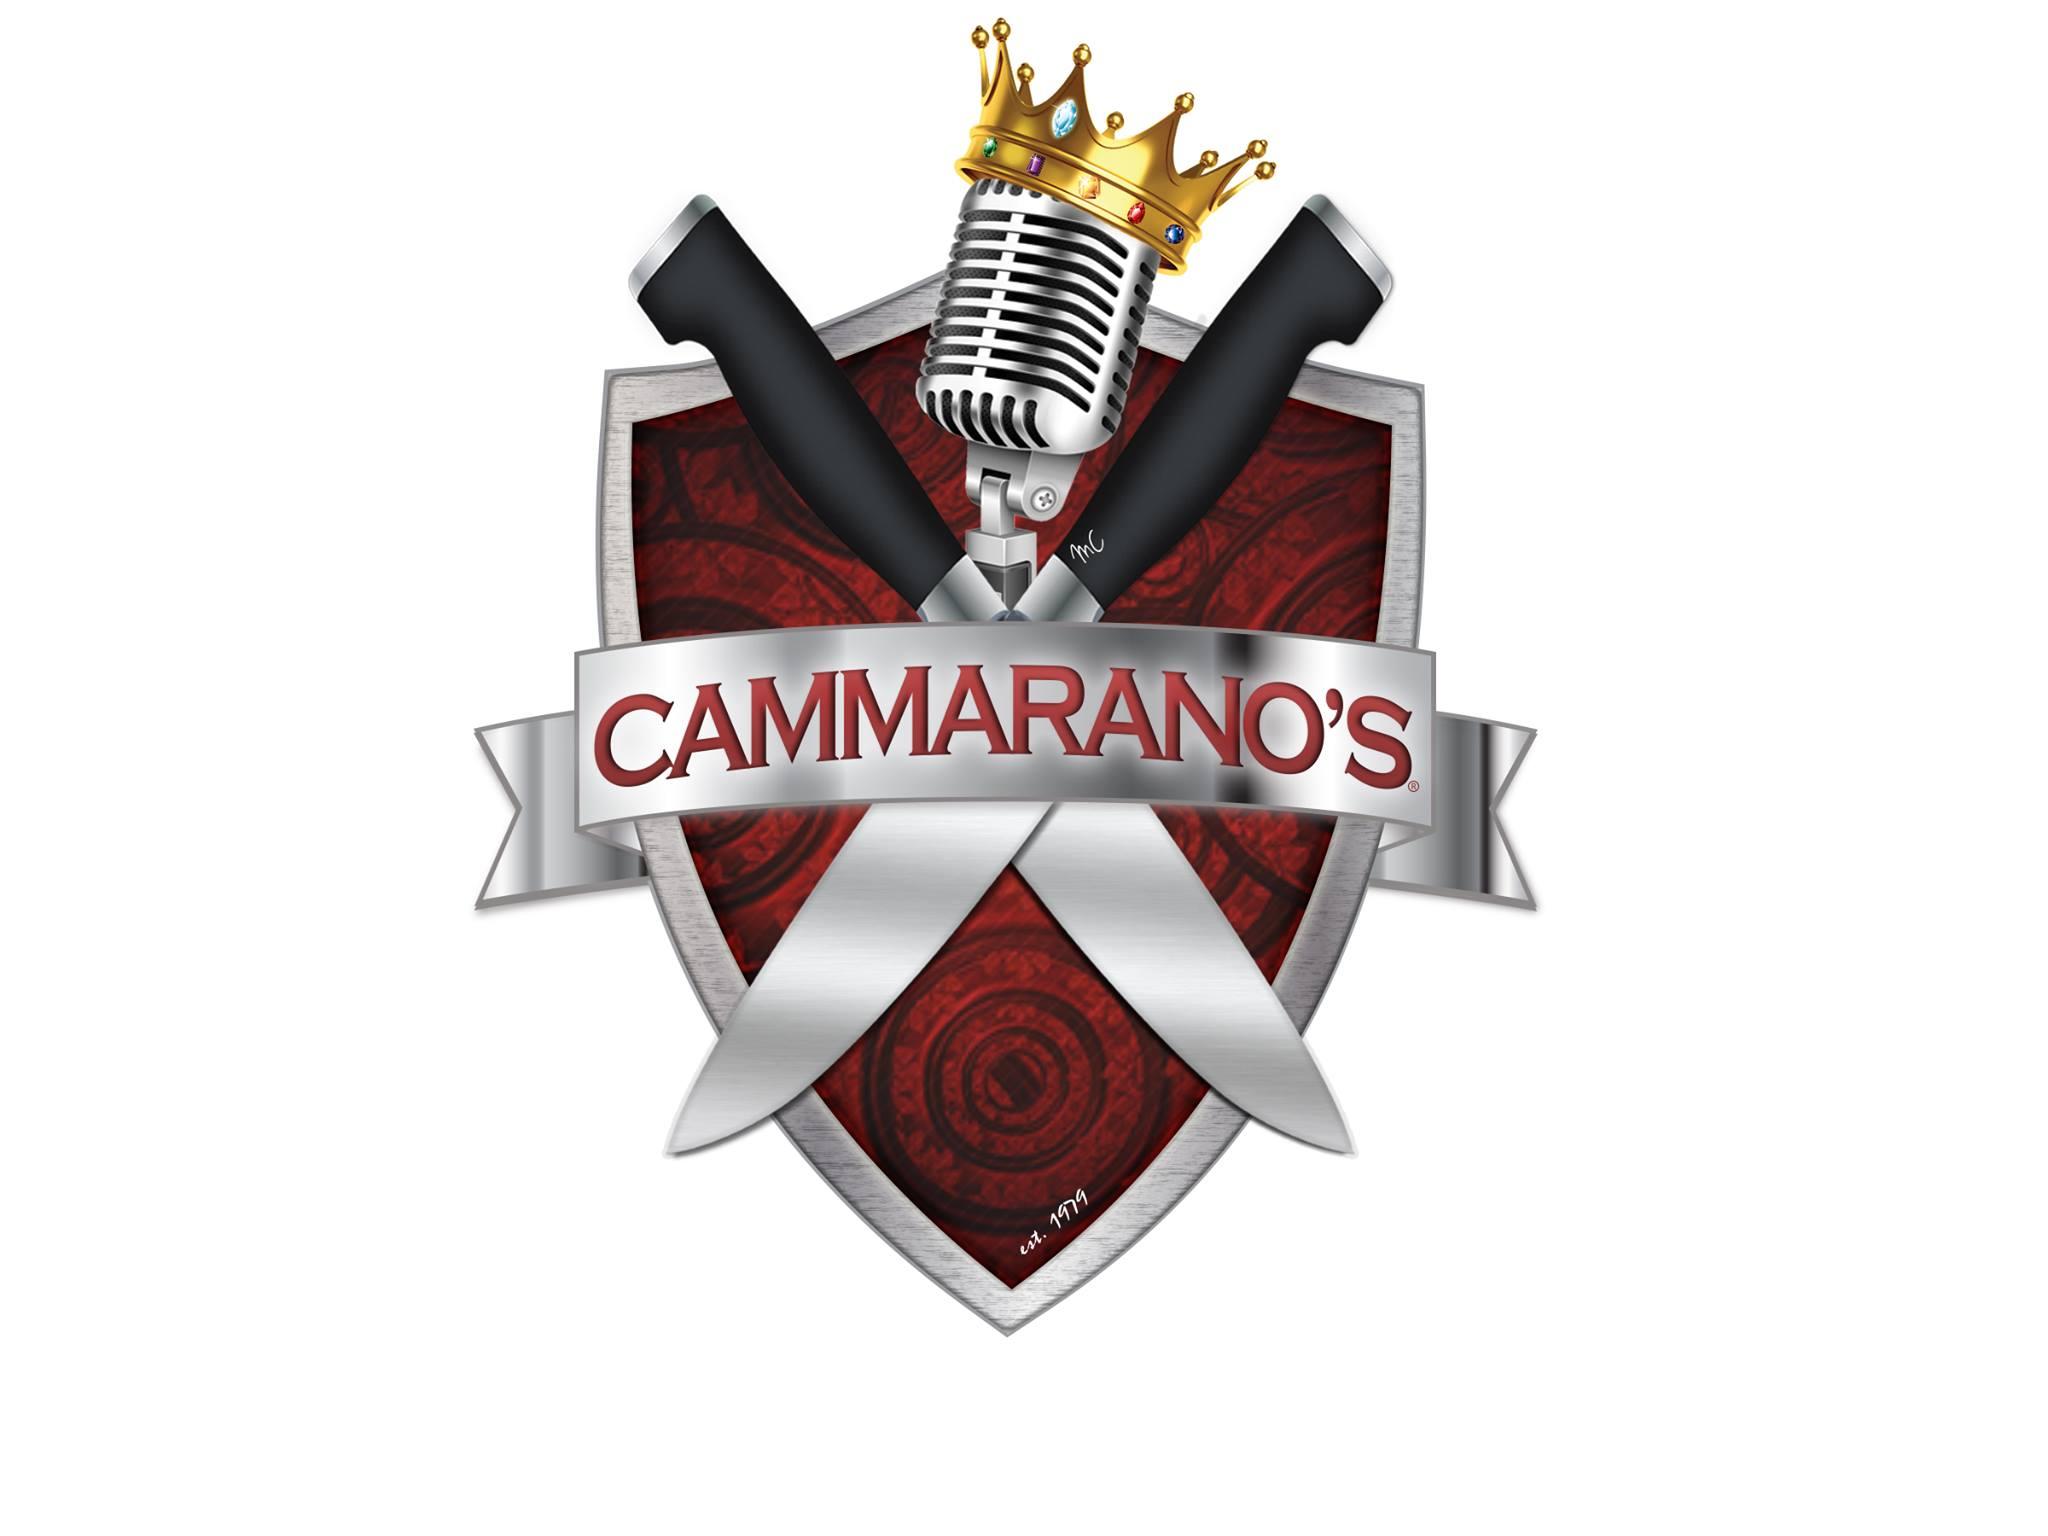 Cammaran's Grill Logo